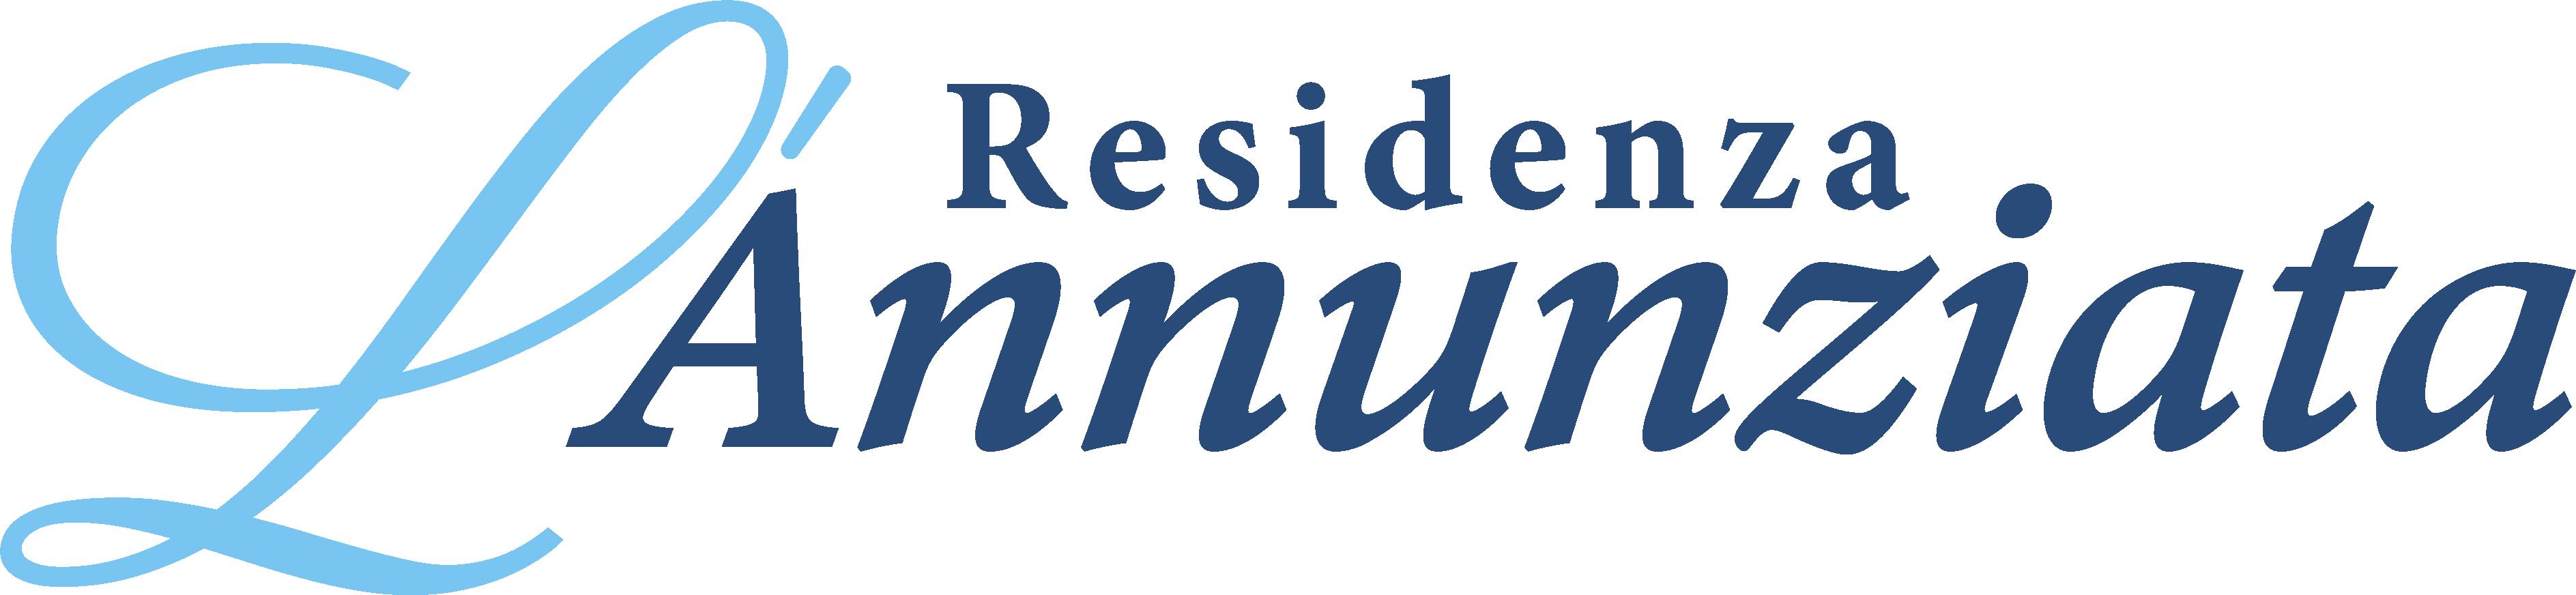 Residenza L'Annunziata